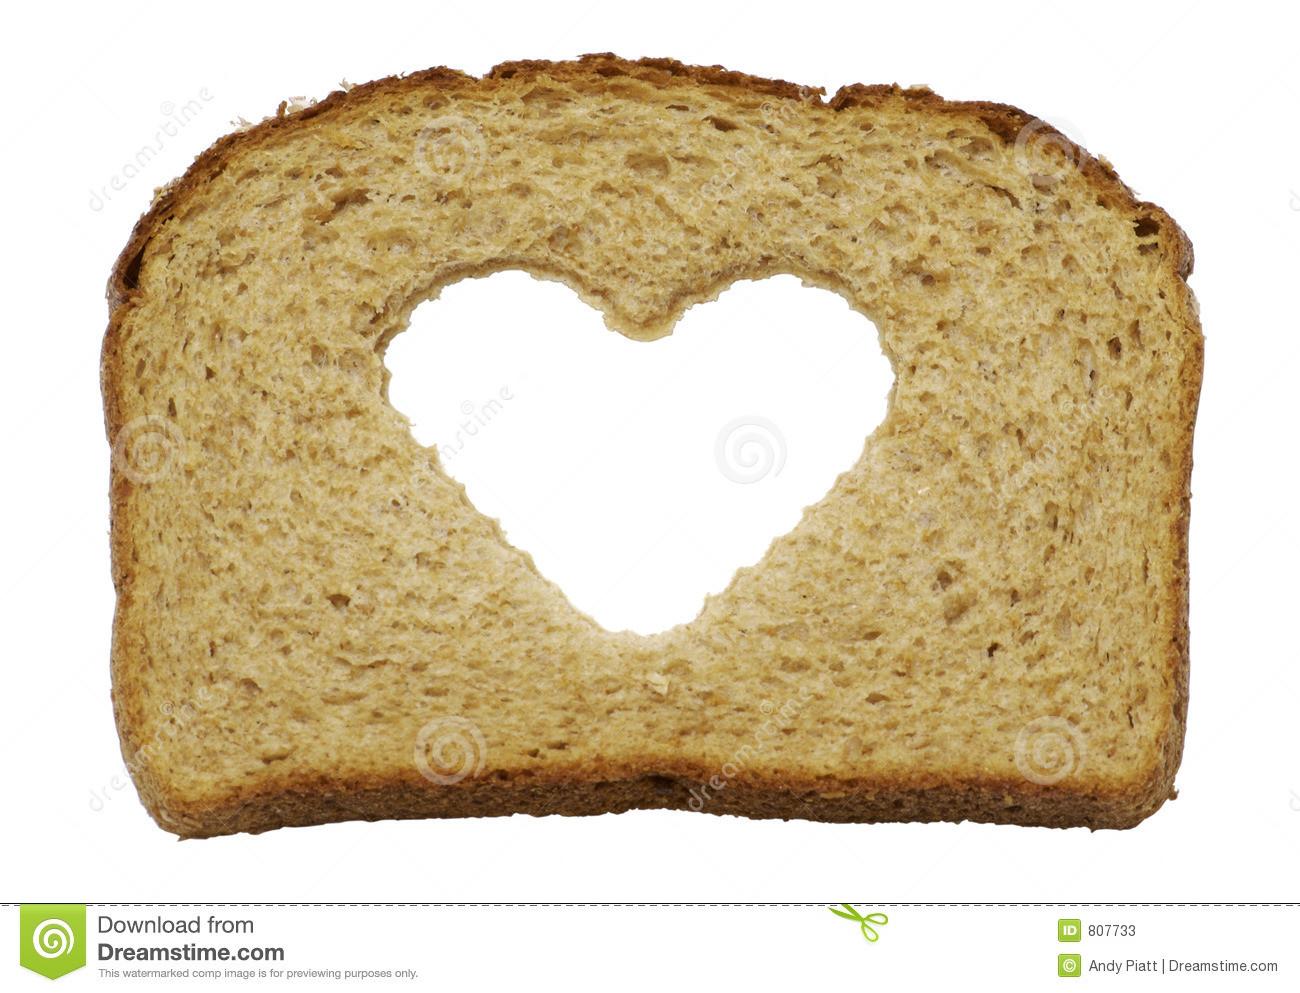 Healthy Wheat Bread  Heart Healthy Whole Wheat Bread Stock s Image